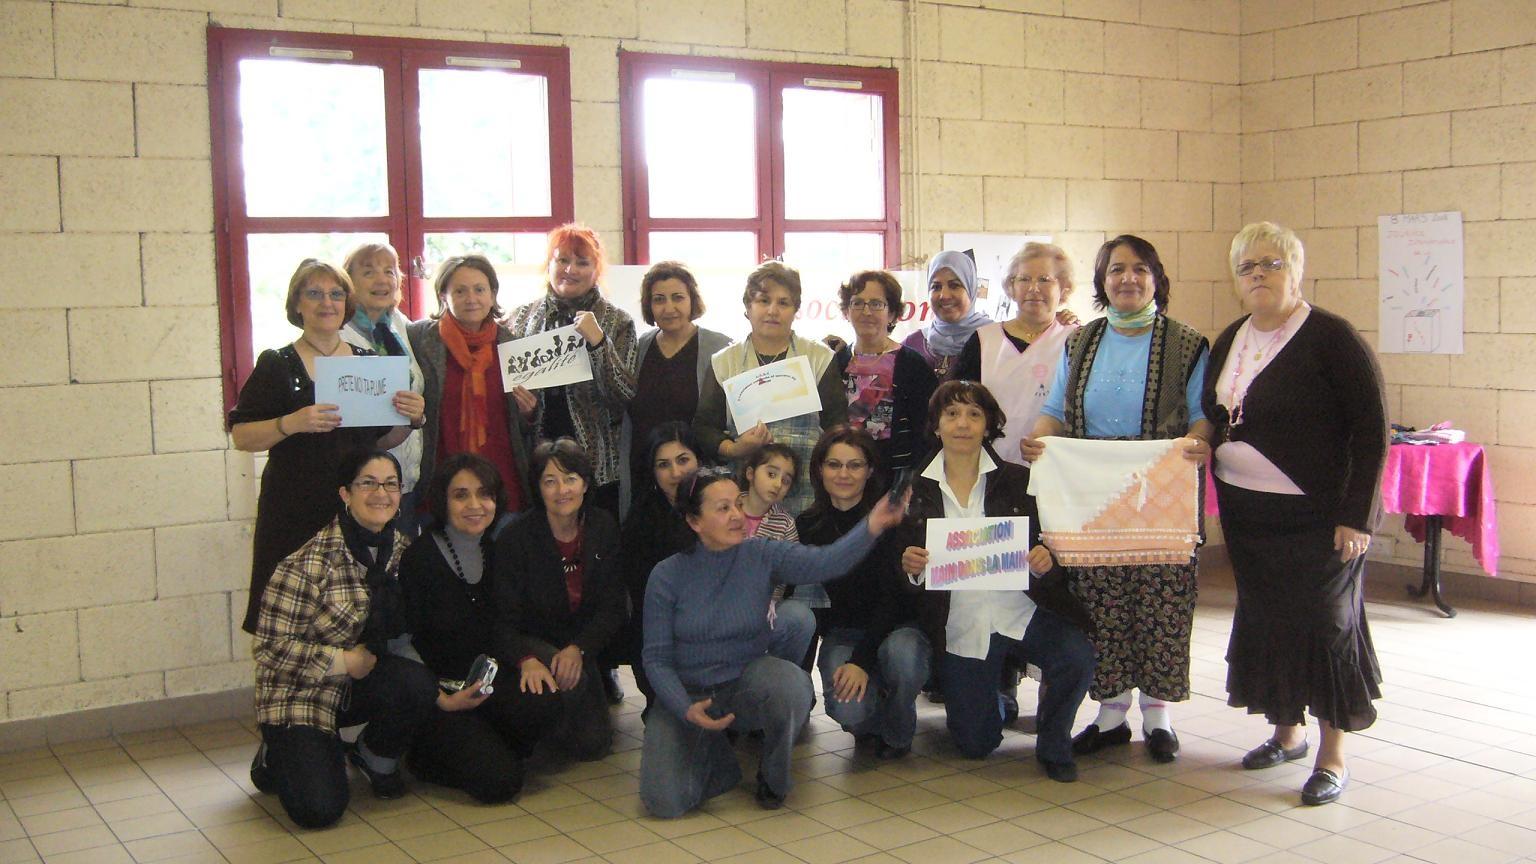 Journée de la femme 2008 Belleroche.jpg